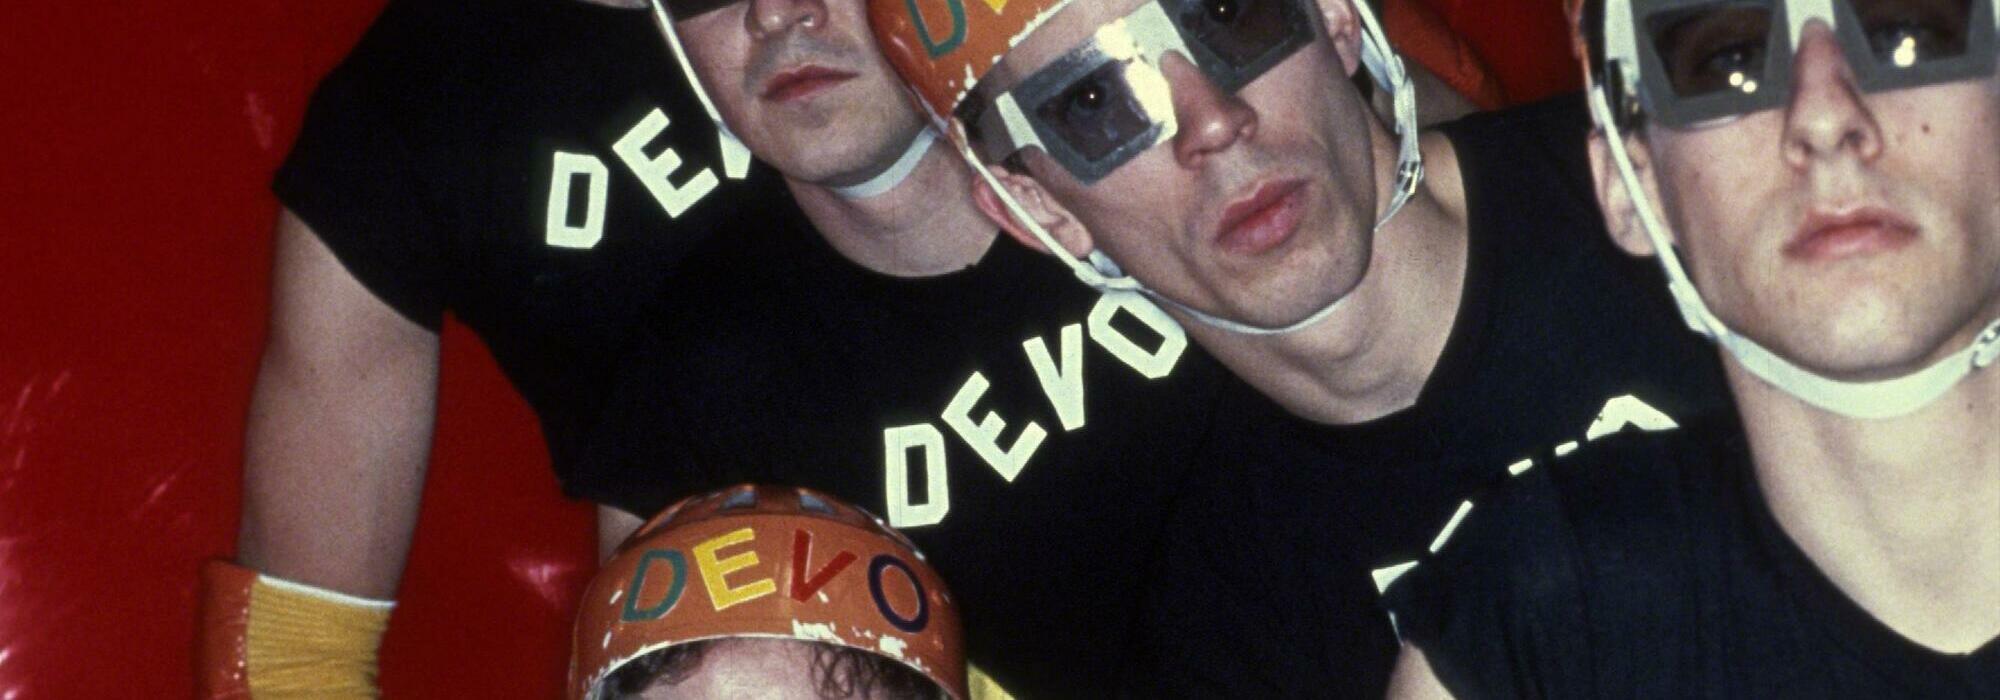 A Devo live event